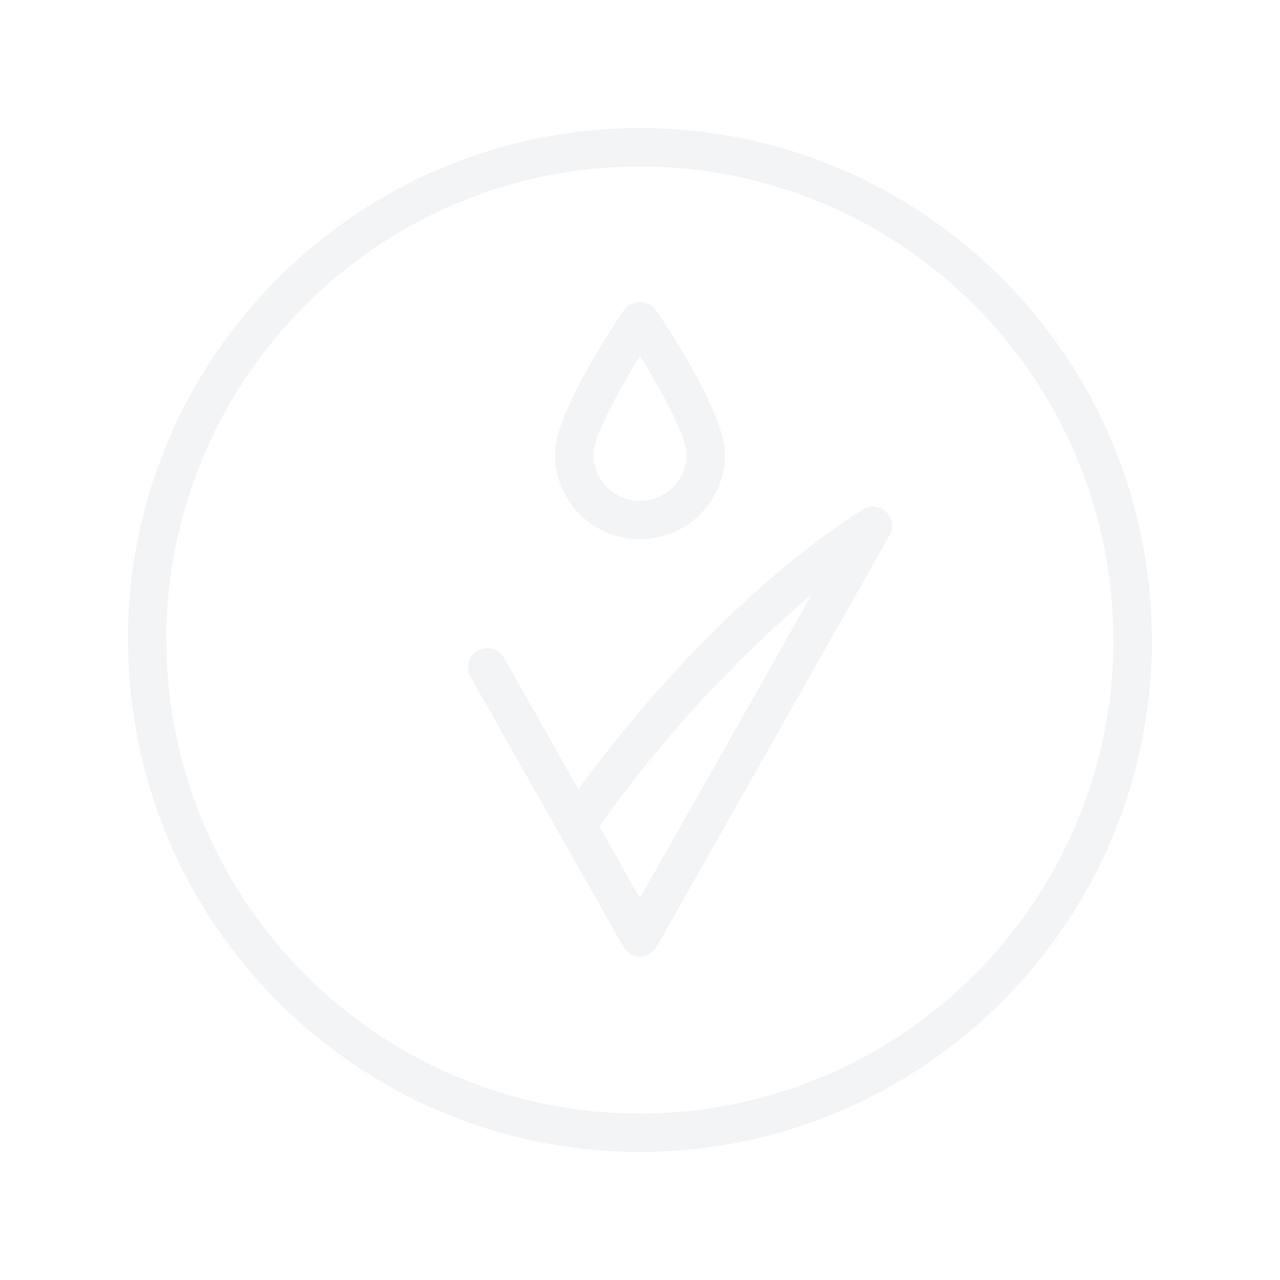 JOICO Vero K-Pak Color Intensity Mermaid Blue 118ml